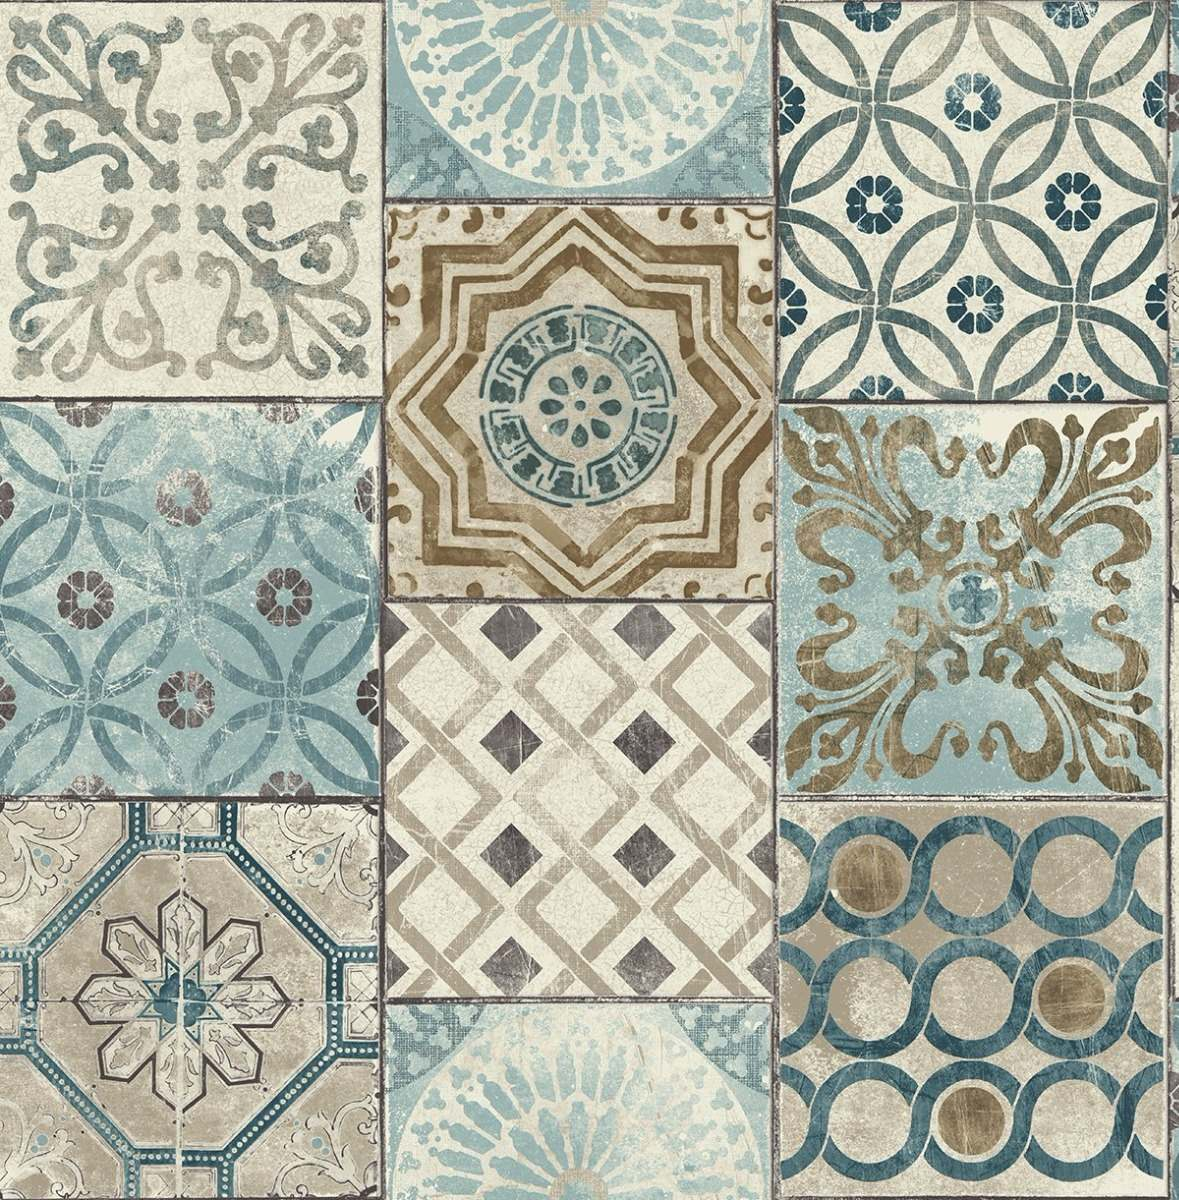 Papel tapiz mosaico marroqu 20pulg x 33pies sala comedor for Mosaico marroqui